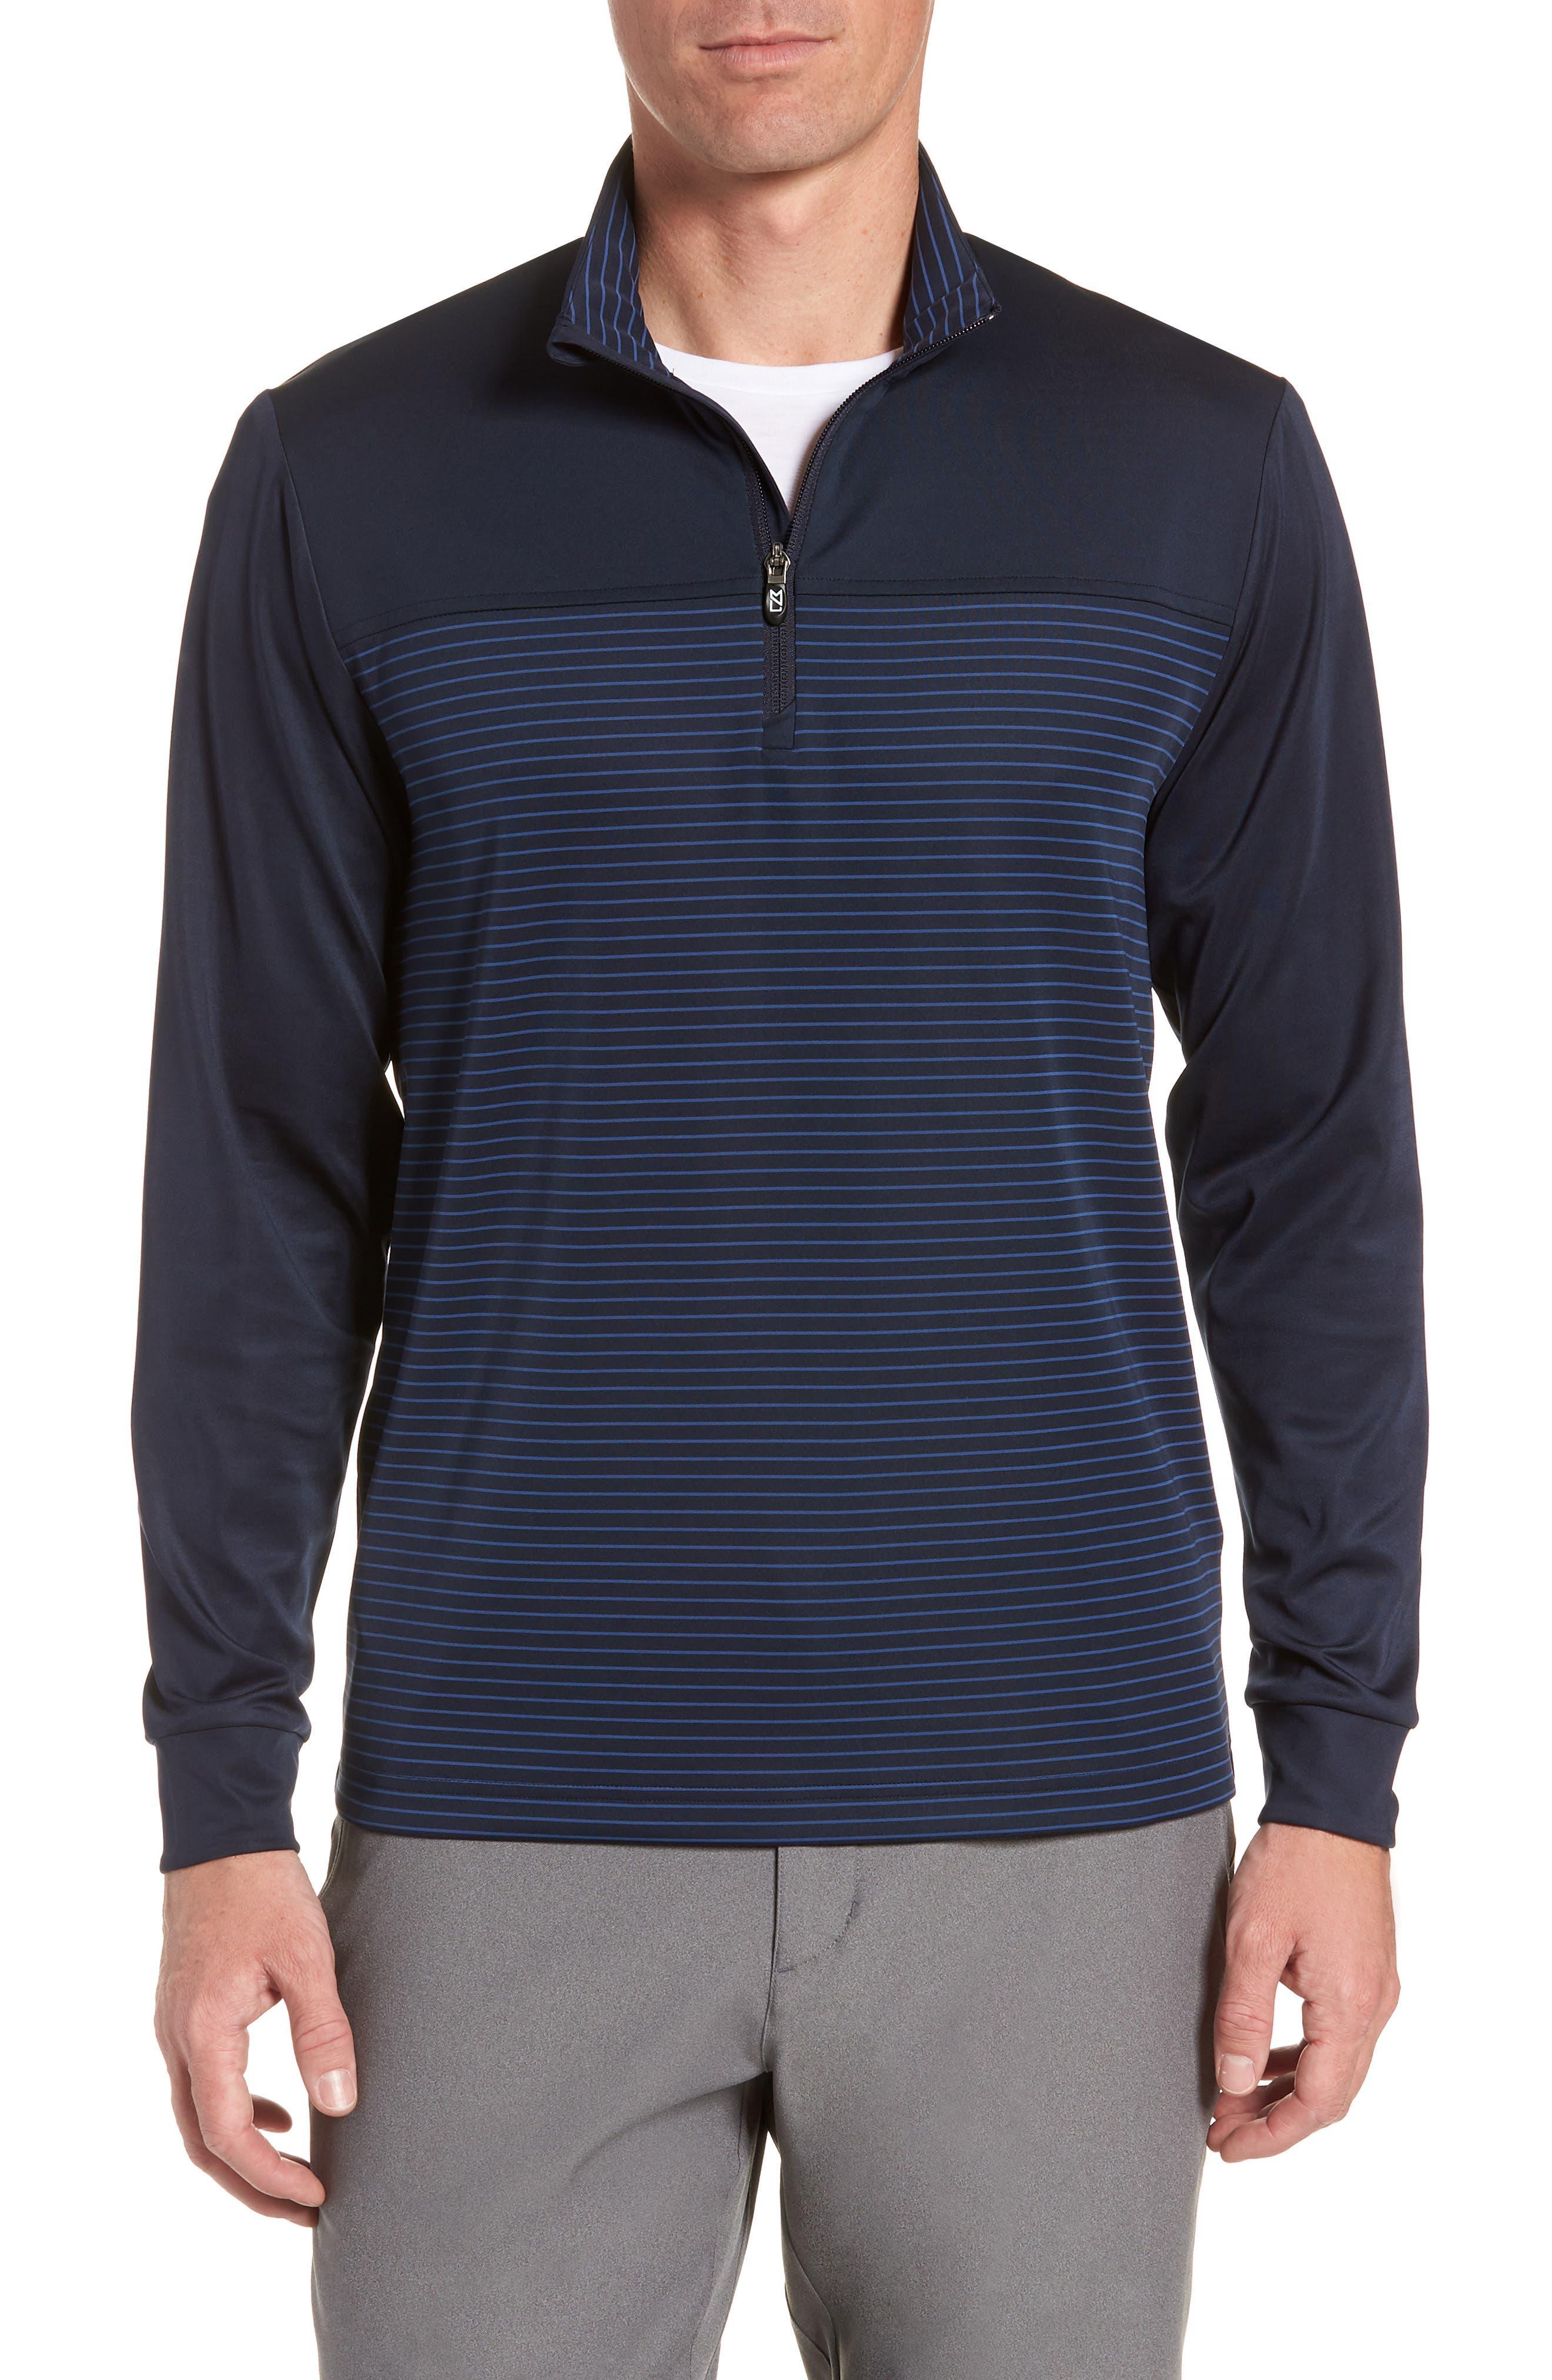 Traverse Regular Fit Quarter Zip Pullover